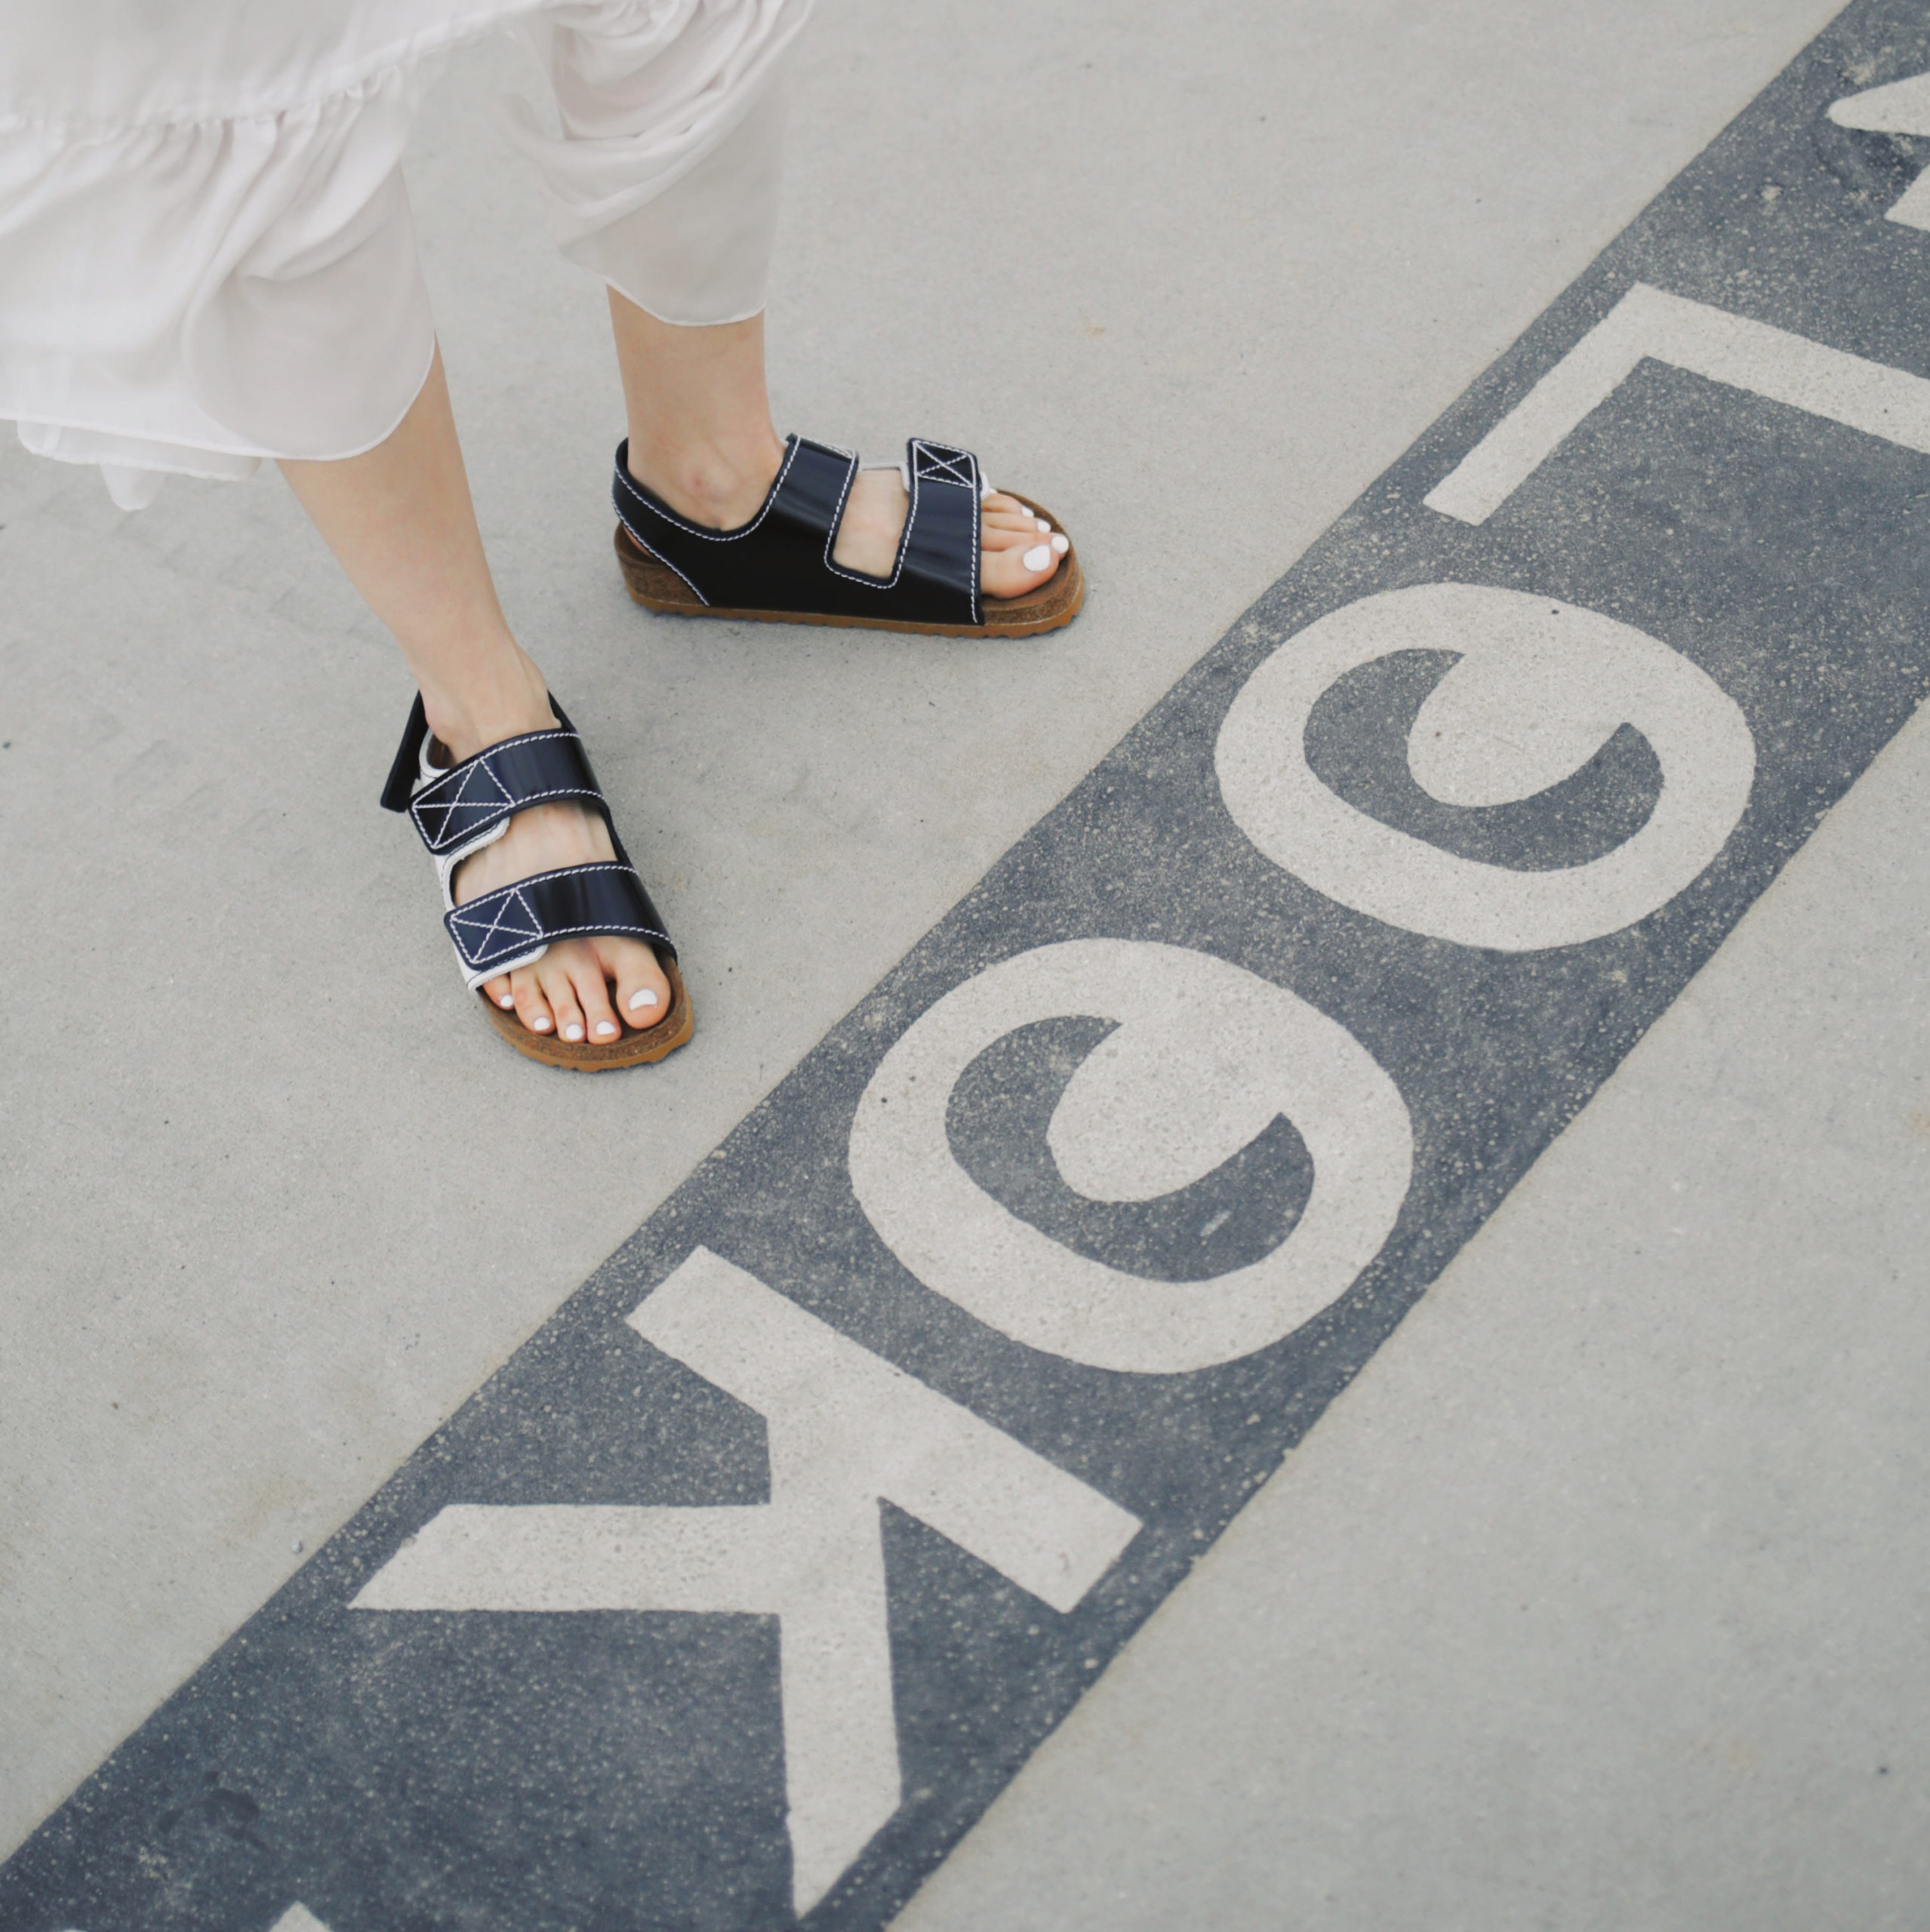 Best Fall Winter 2020 shoes and boots trends: comfortable slides proenza schouler birkenstock